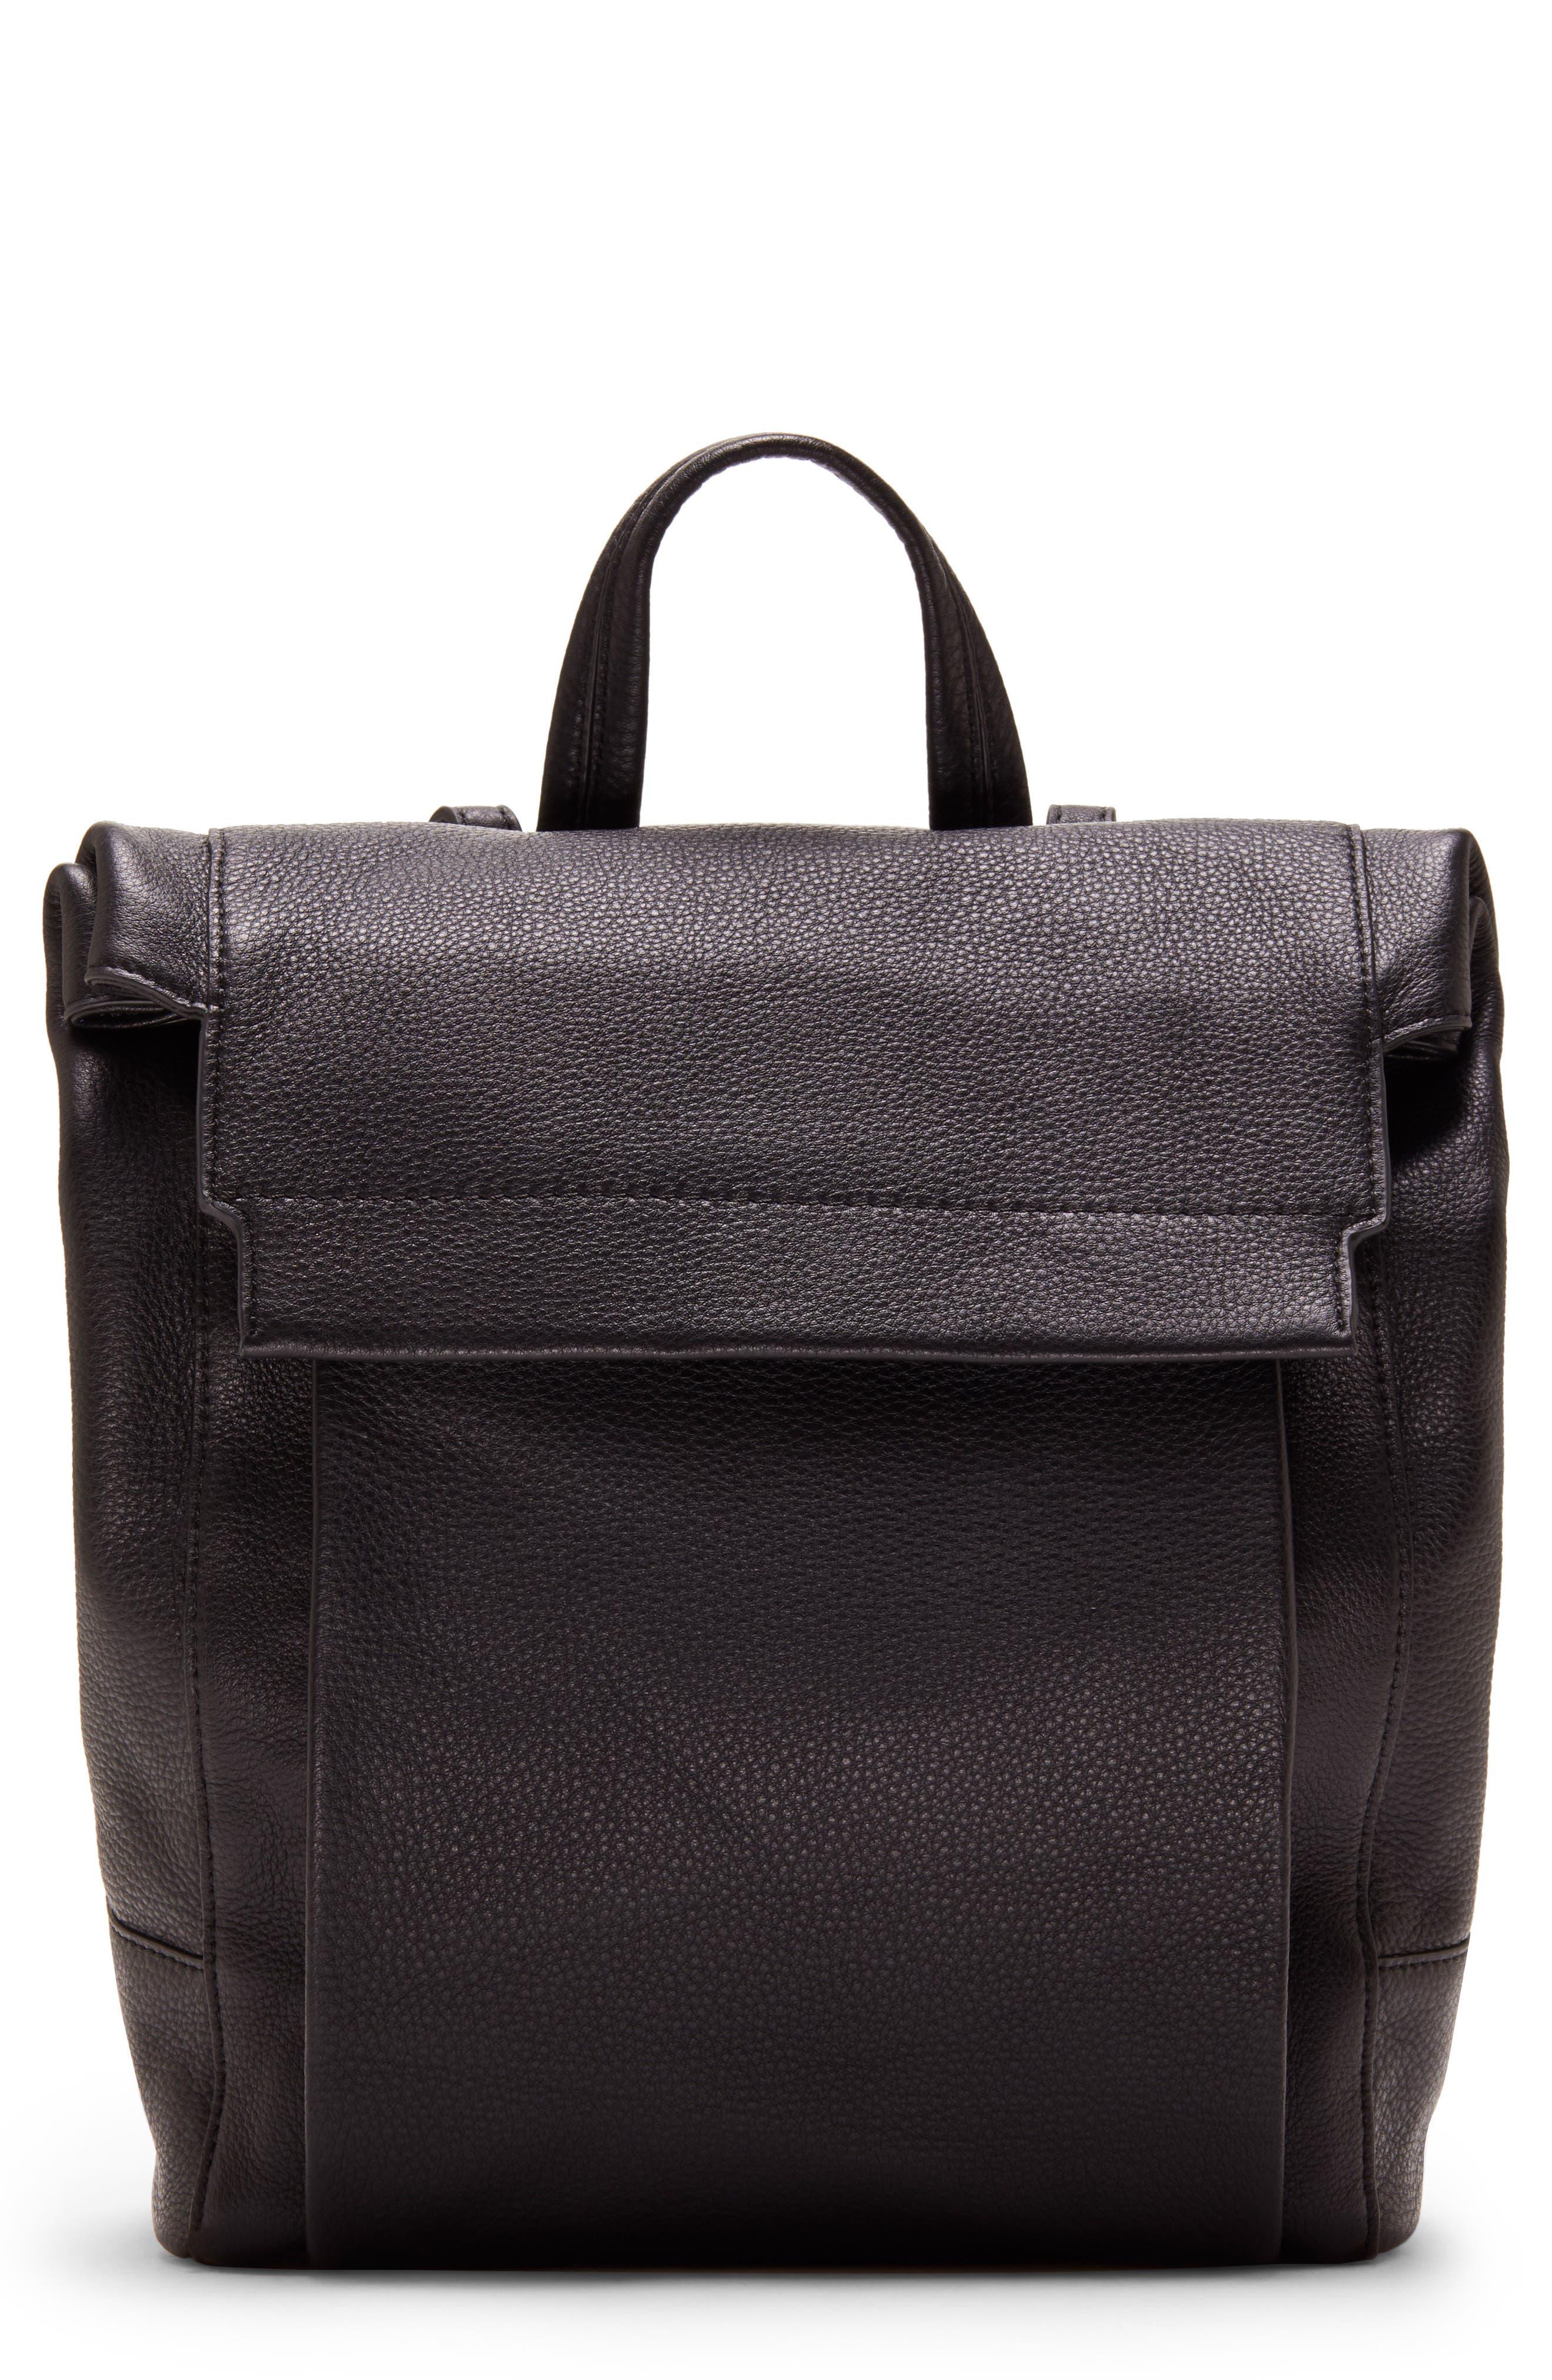 Min Pebbled Leather Backpack,                         Main,                         color, BLACK